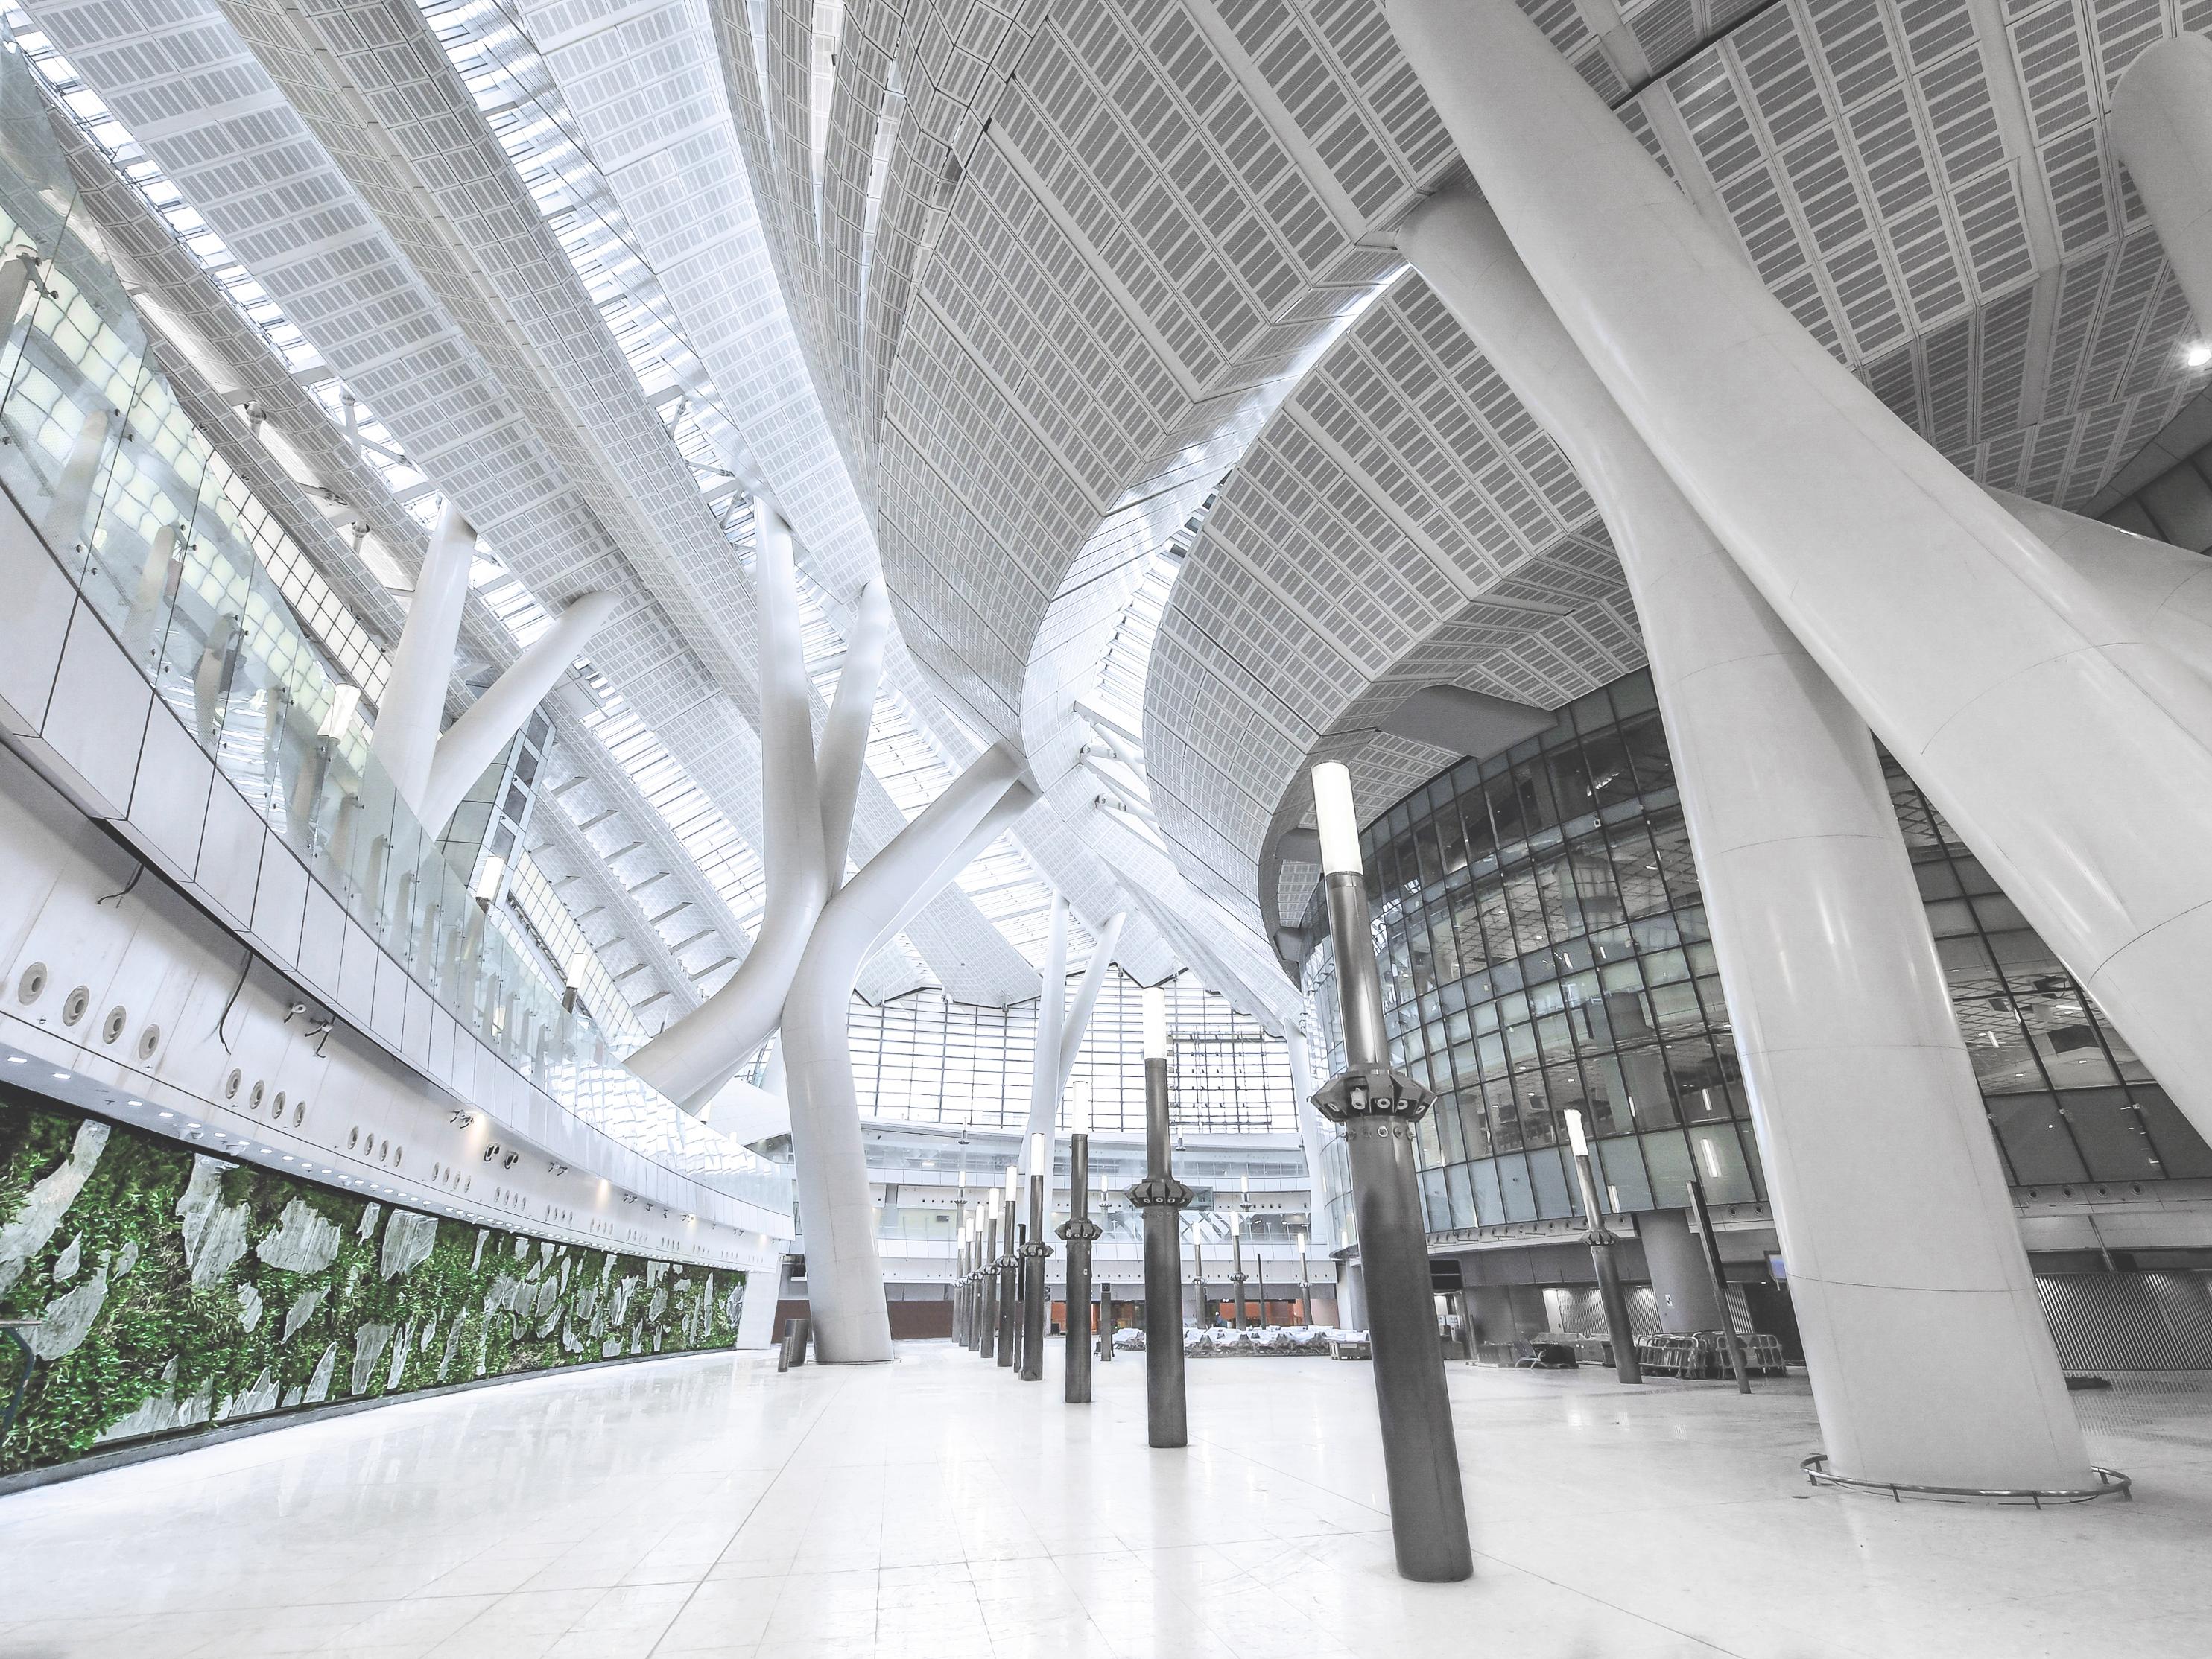 tn_cn-hk-xrl-westkowloon-station_01